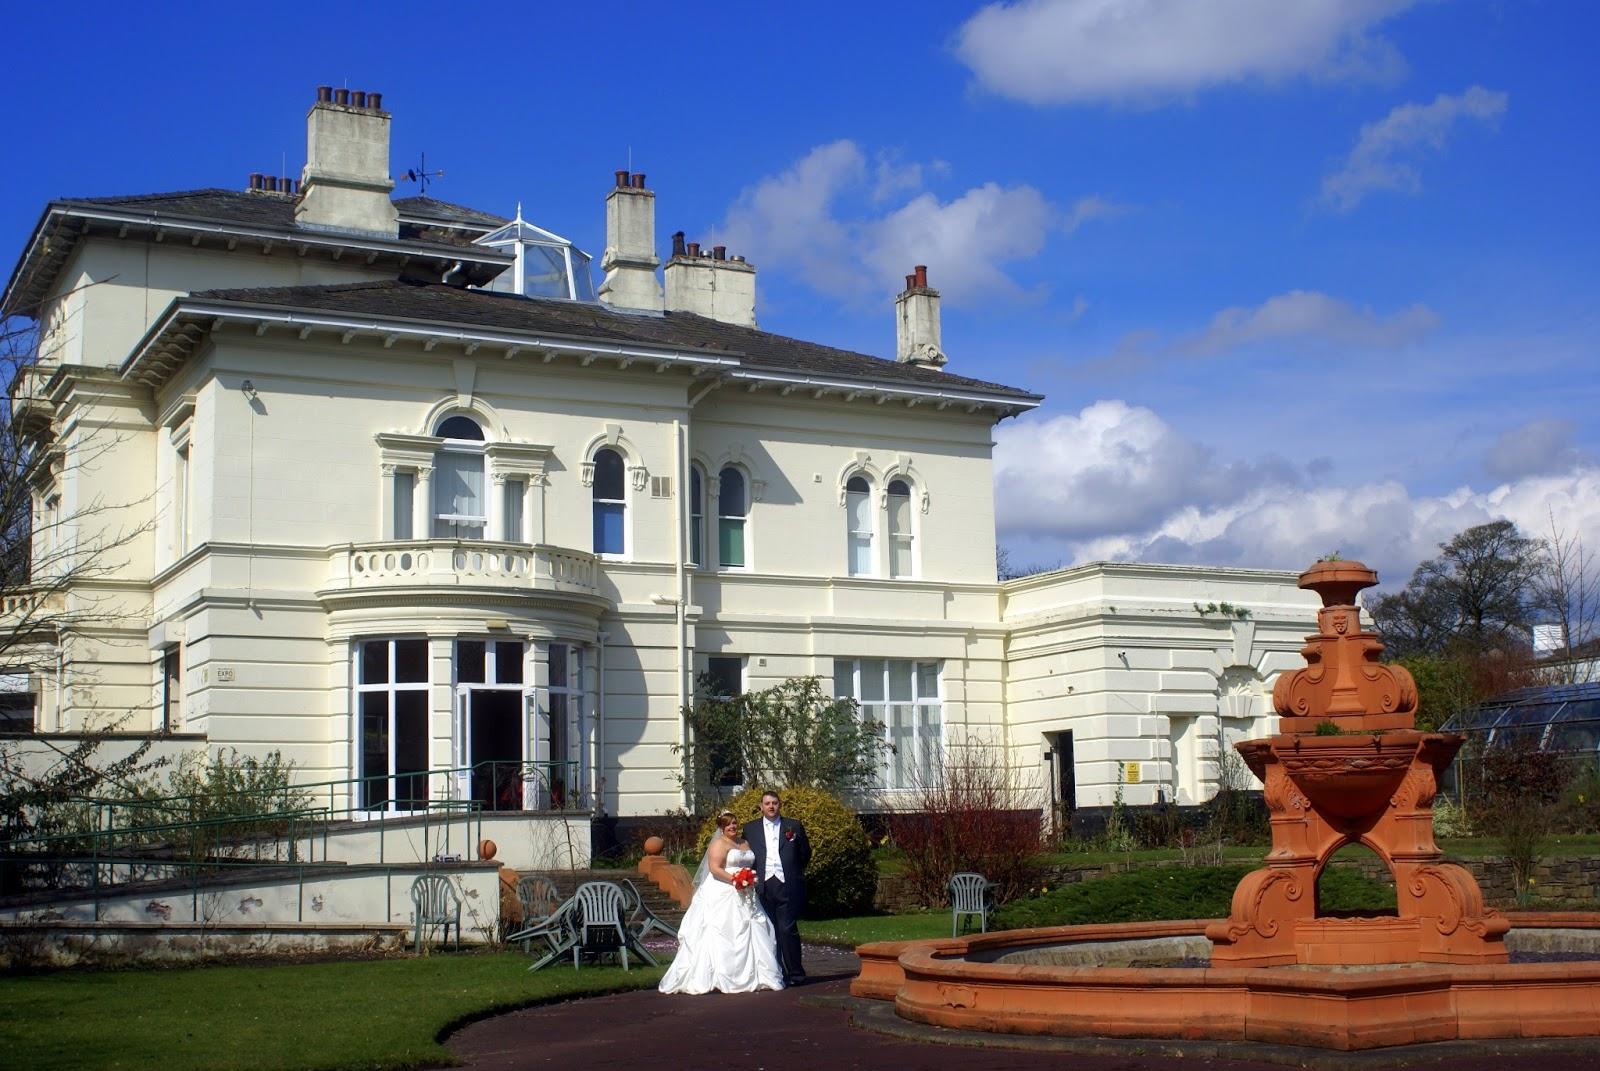 wedding world photography the mansion house st helens. Black Bedroom Furniture Sets. Home Design Ideas